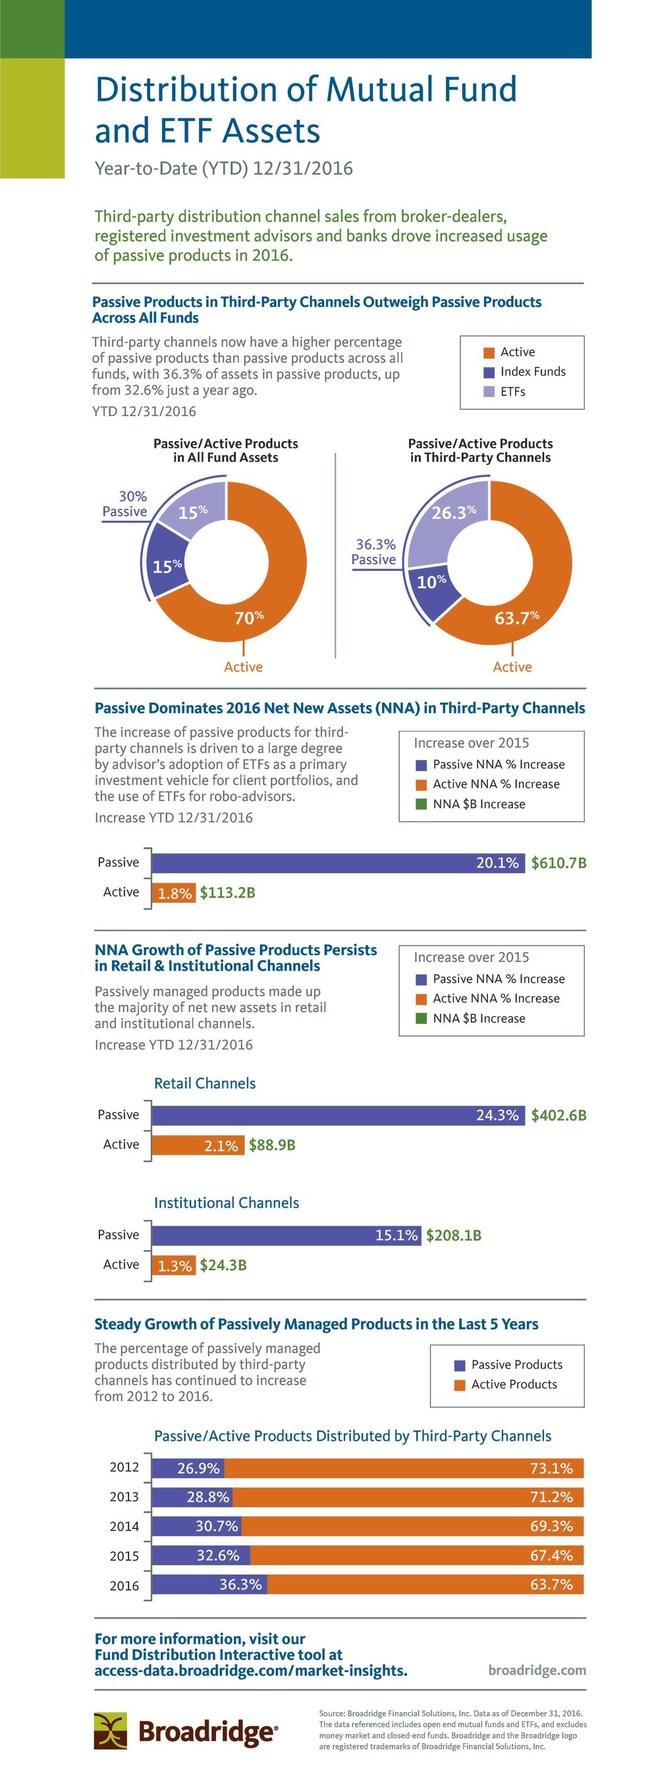 Active/Passive Asset Distribution via Third-party Channels YTD 12/31/16